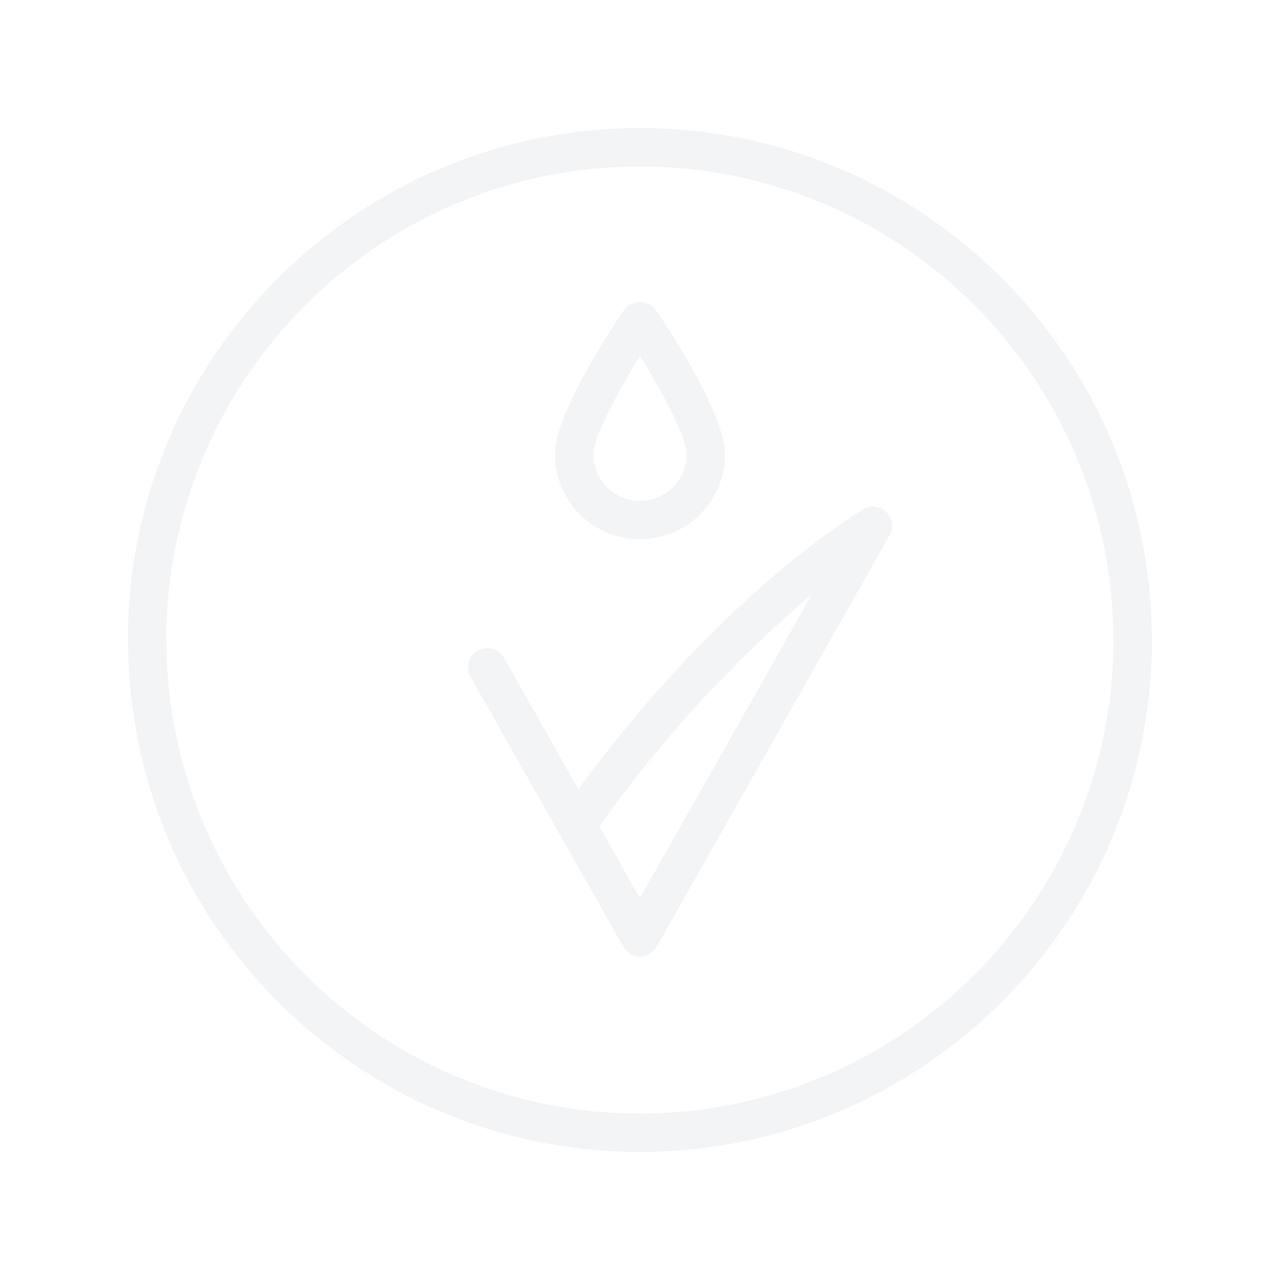 ALESSANDRO Striplac Nail Polish No.77 Midnight Black 8ml